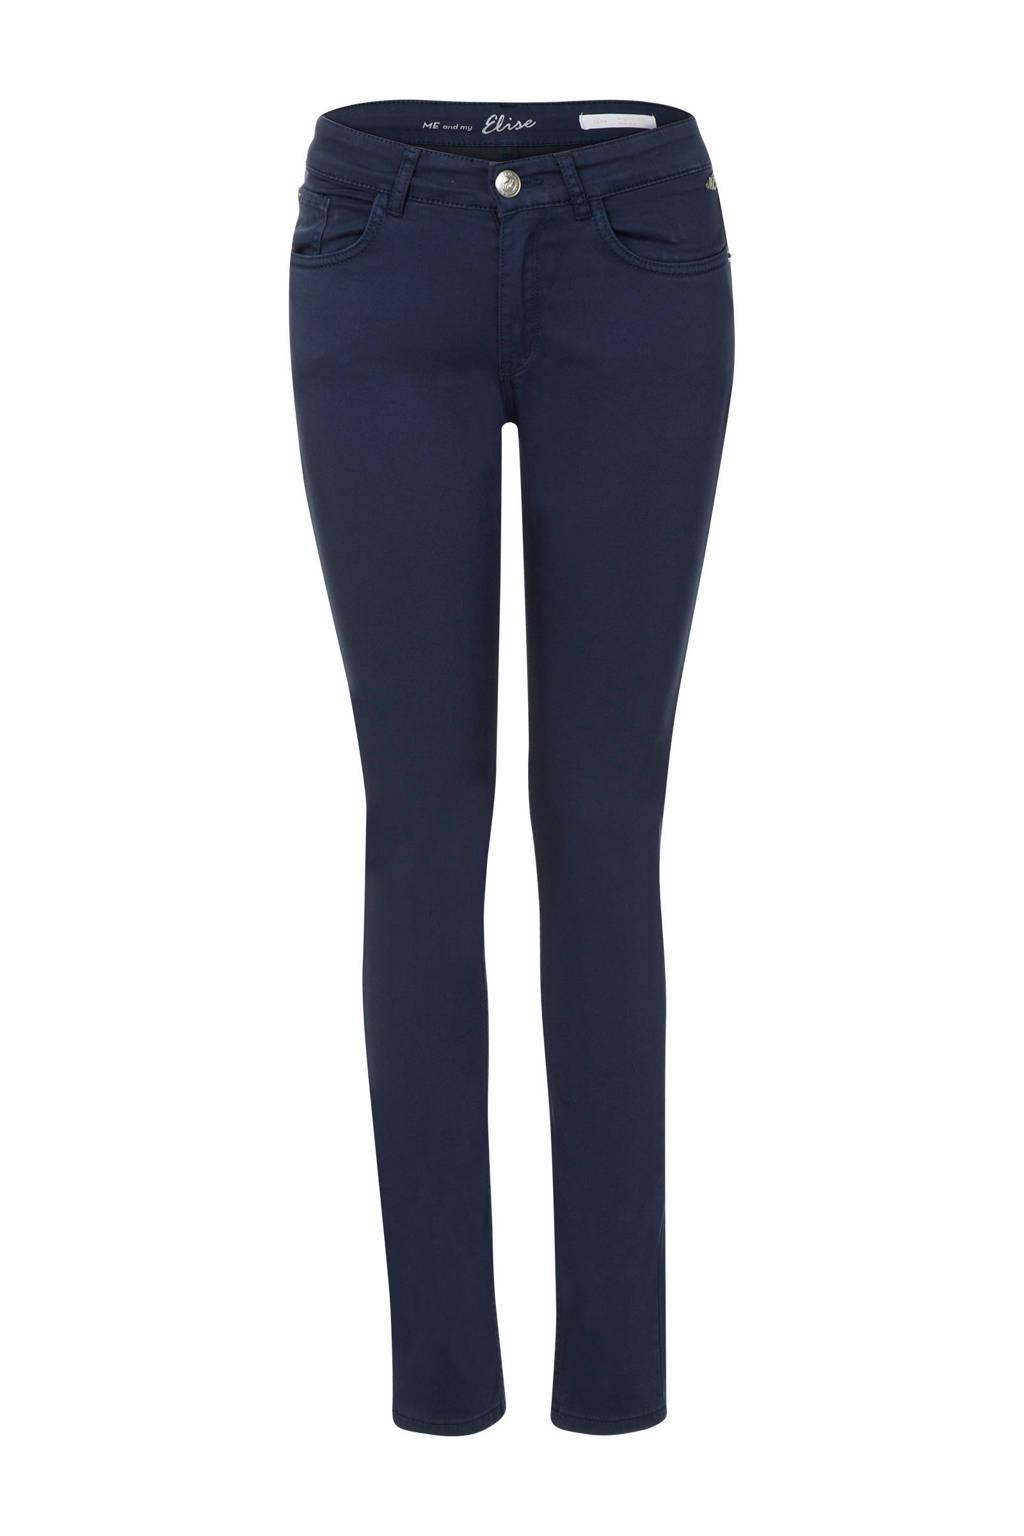 Miss Etam Regulier slim fit broek donkerblauw, Donkerblauw